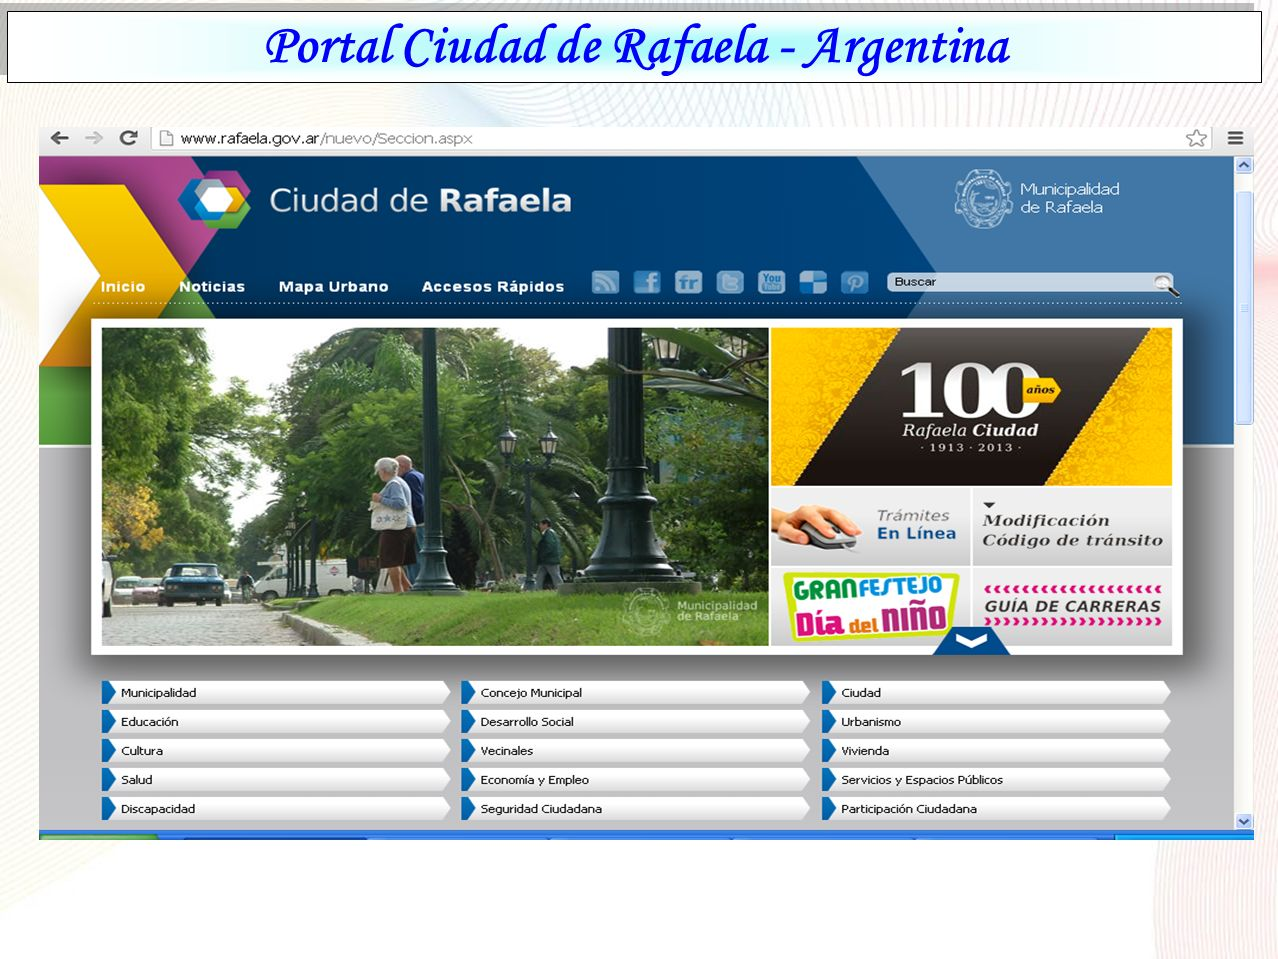 Portal Ciudad de Rafaela - Argentina